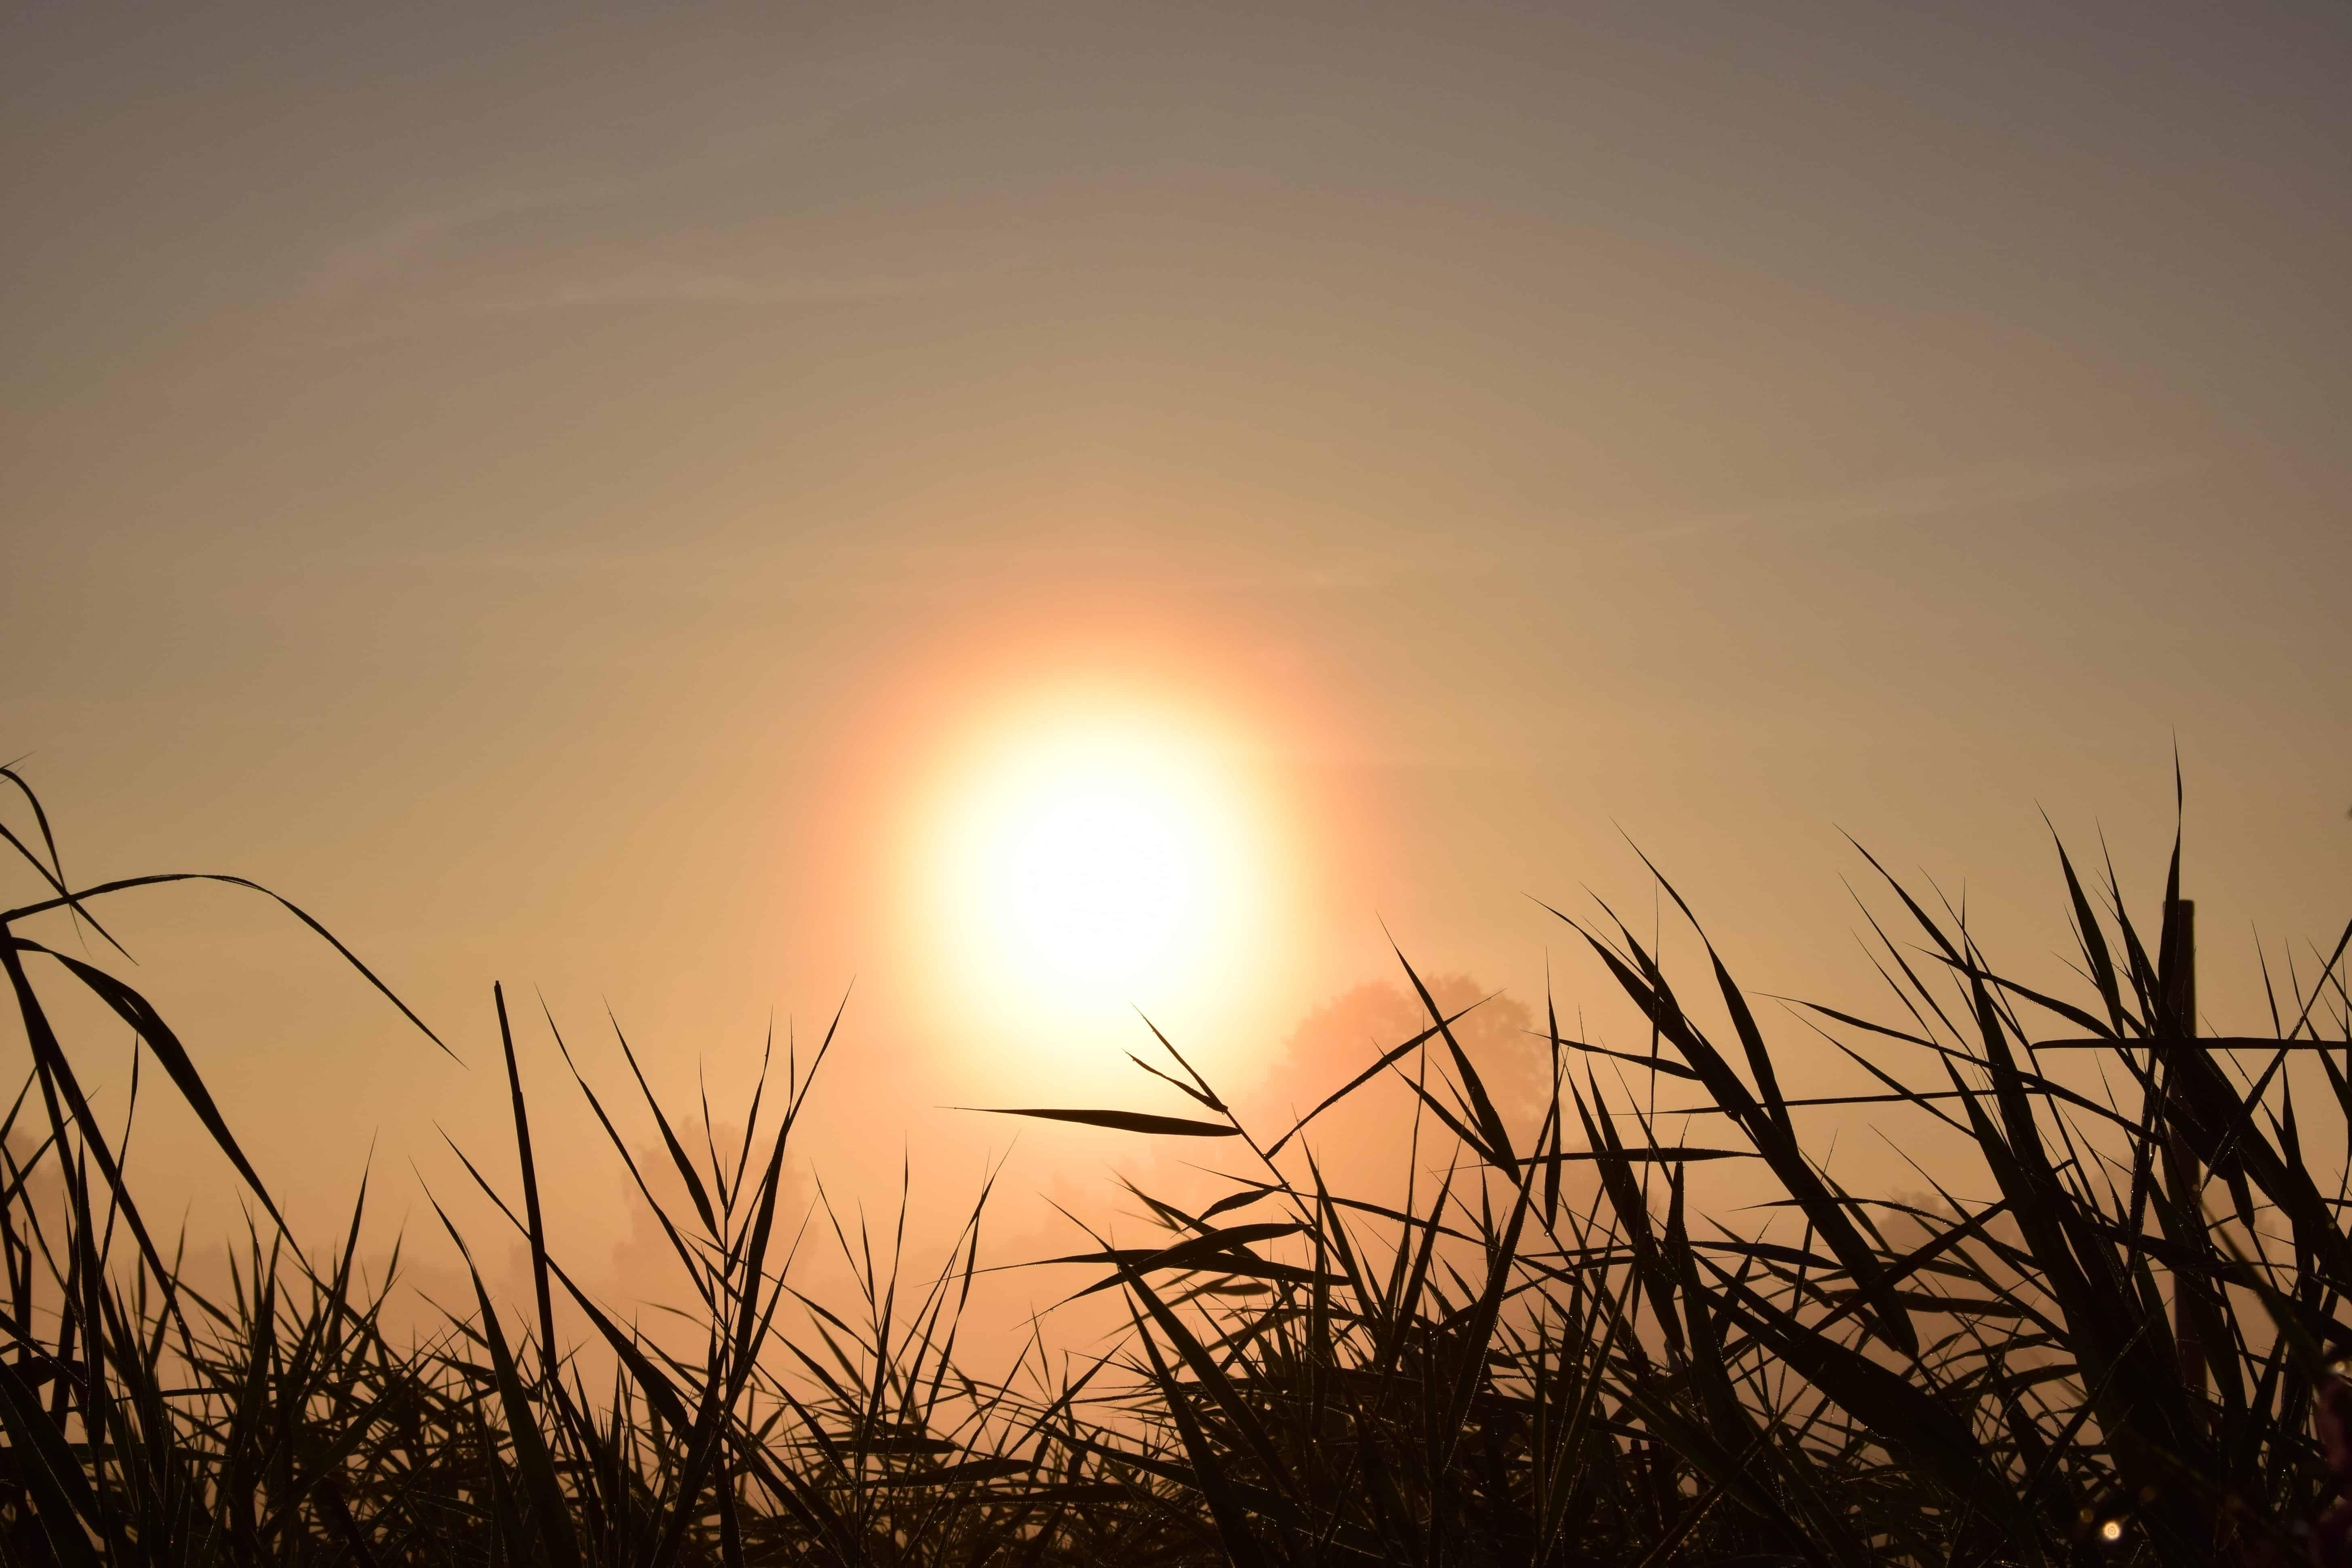 Sunrise free images, public domain images